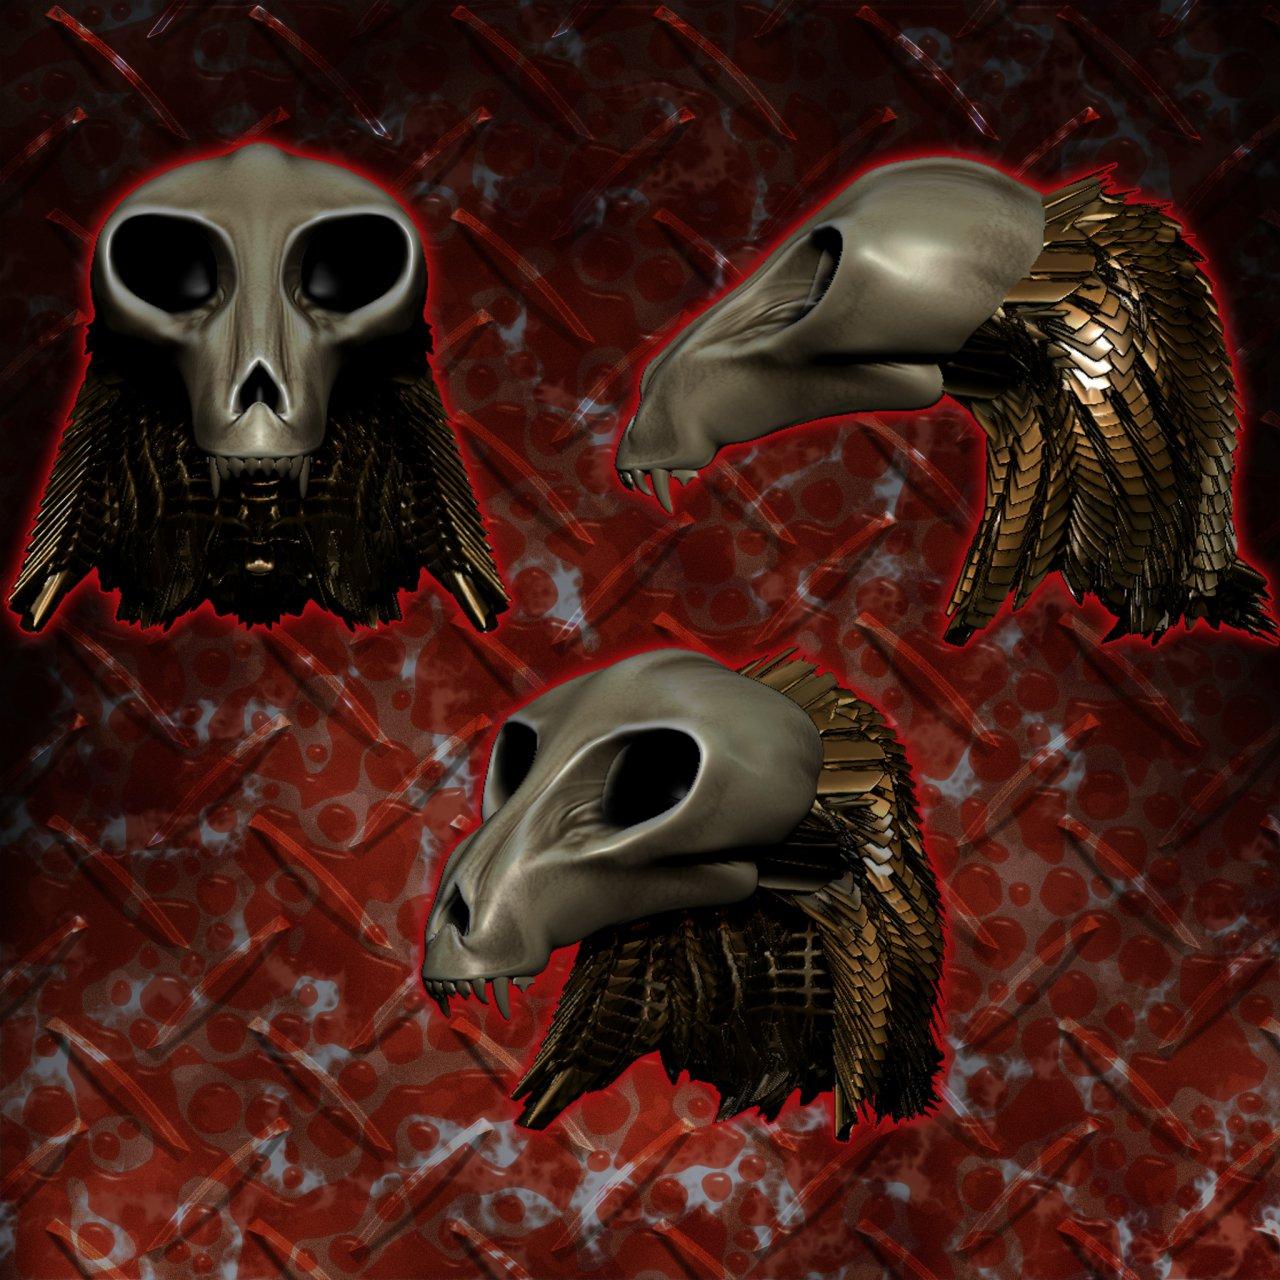 Skull Mask (Zbrush)